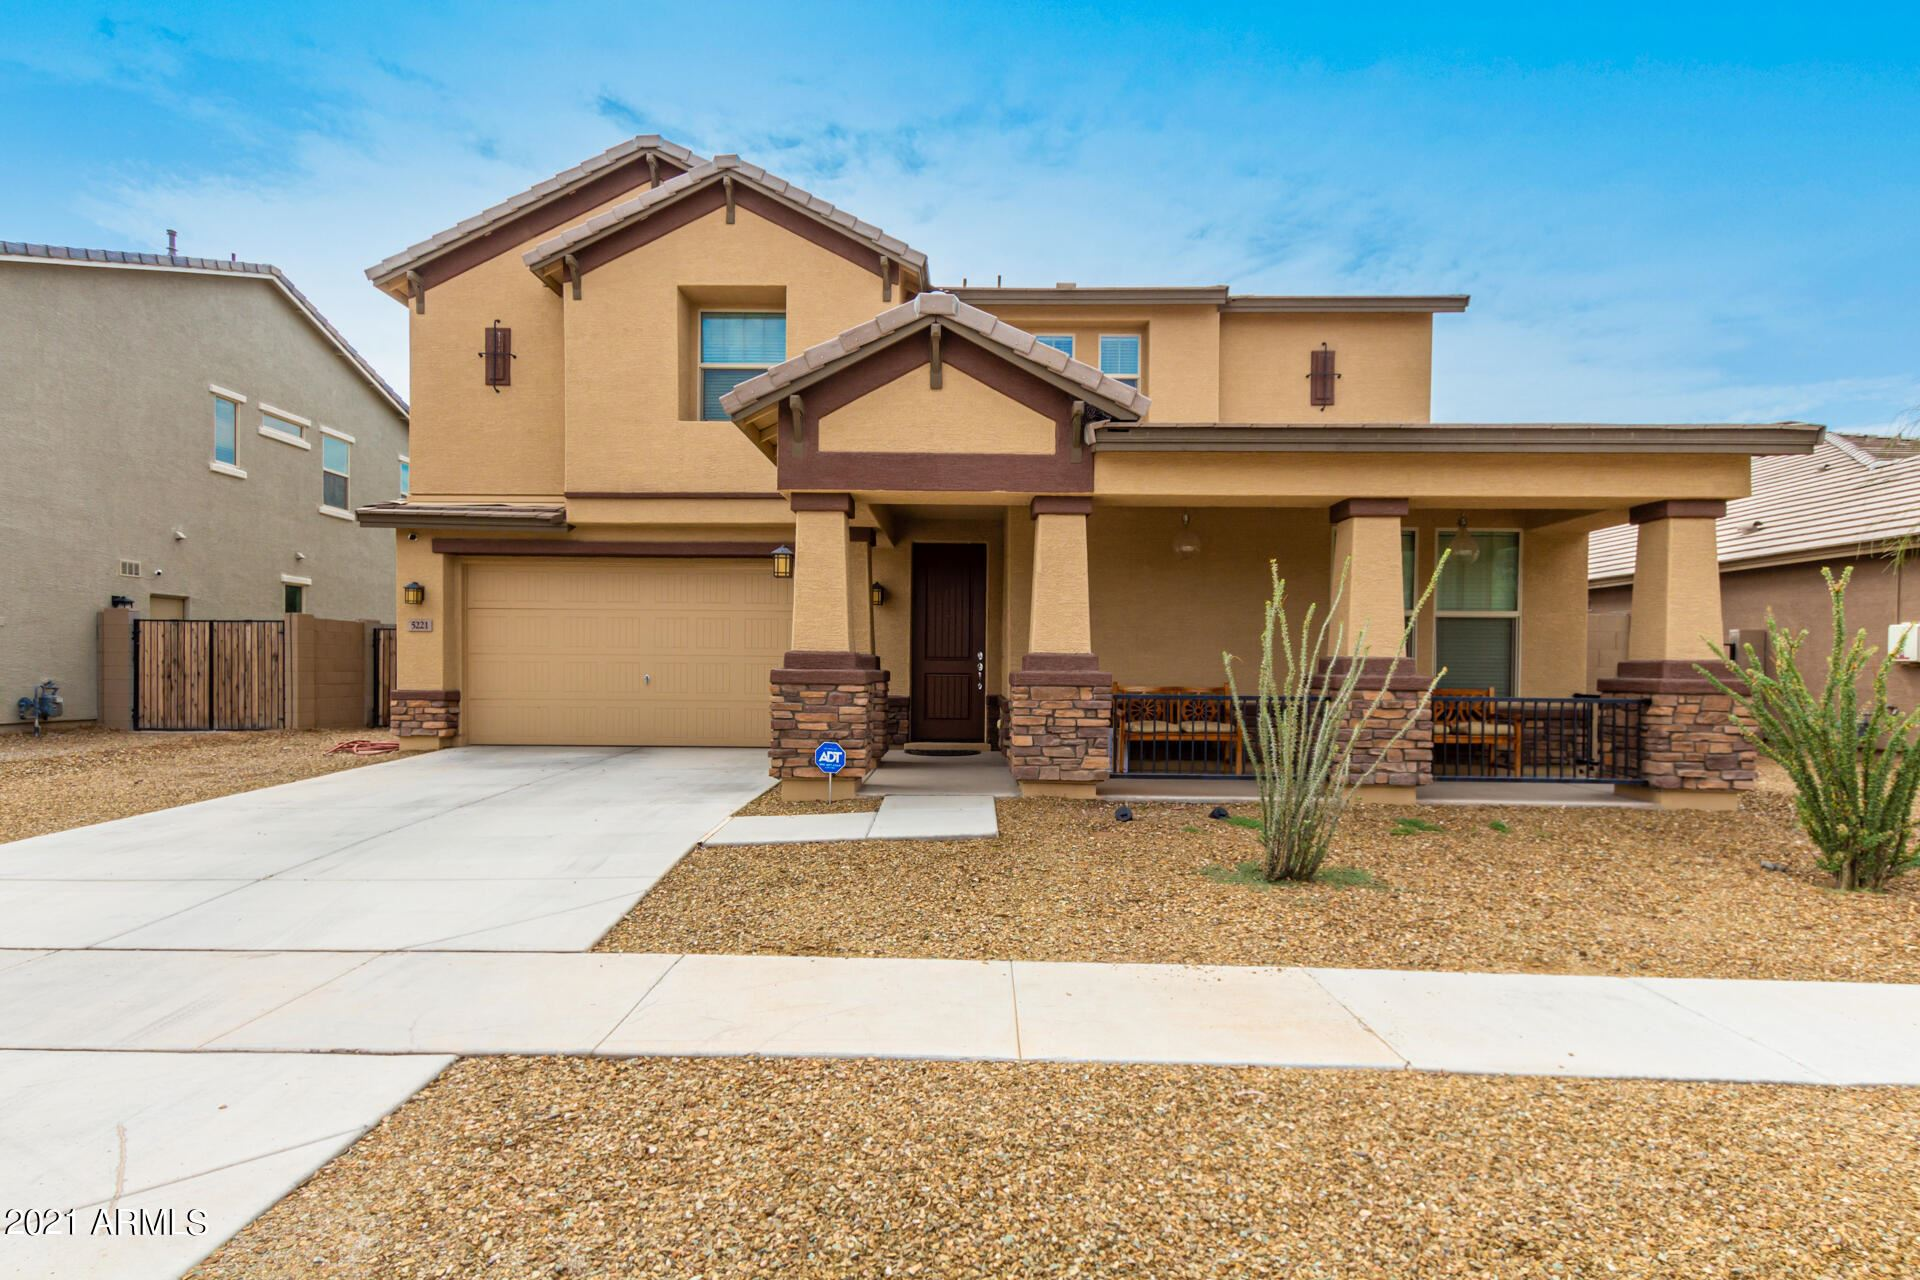 Photo of 5221 W LYDIA Lane, Laveen, AZ 85339 (MLS # 6287924)